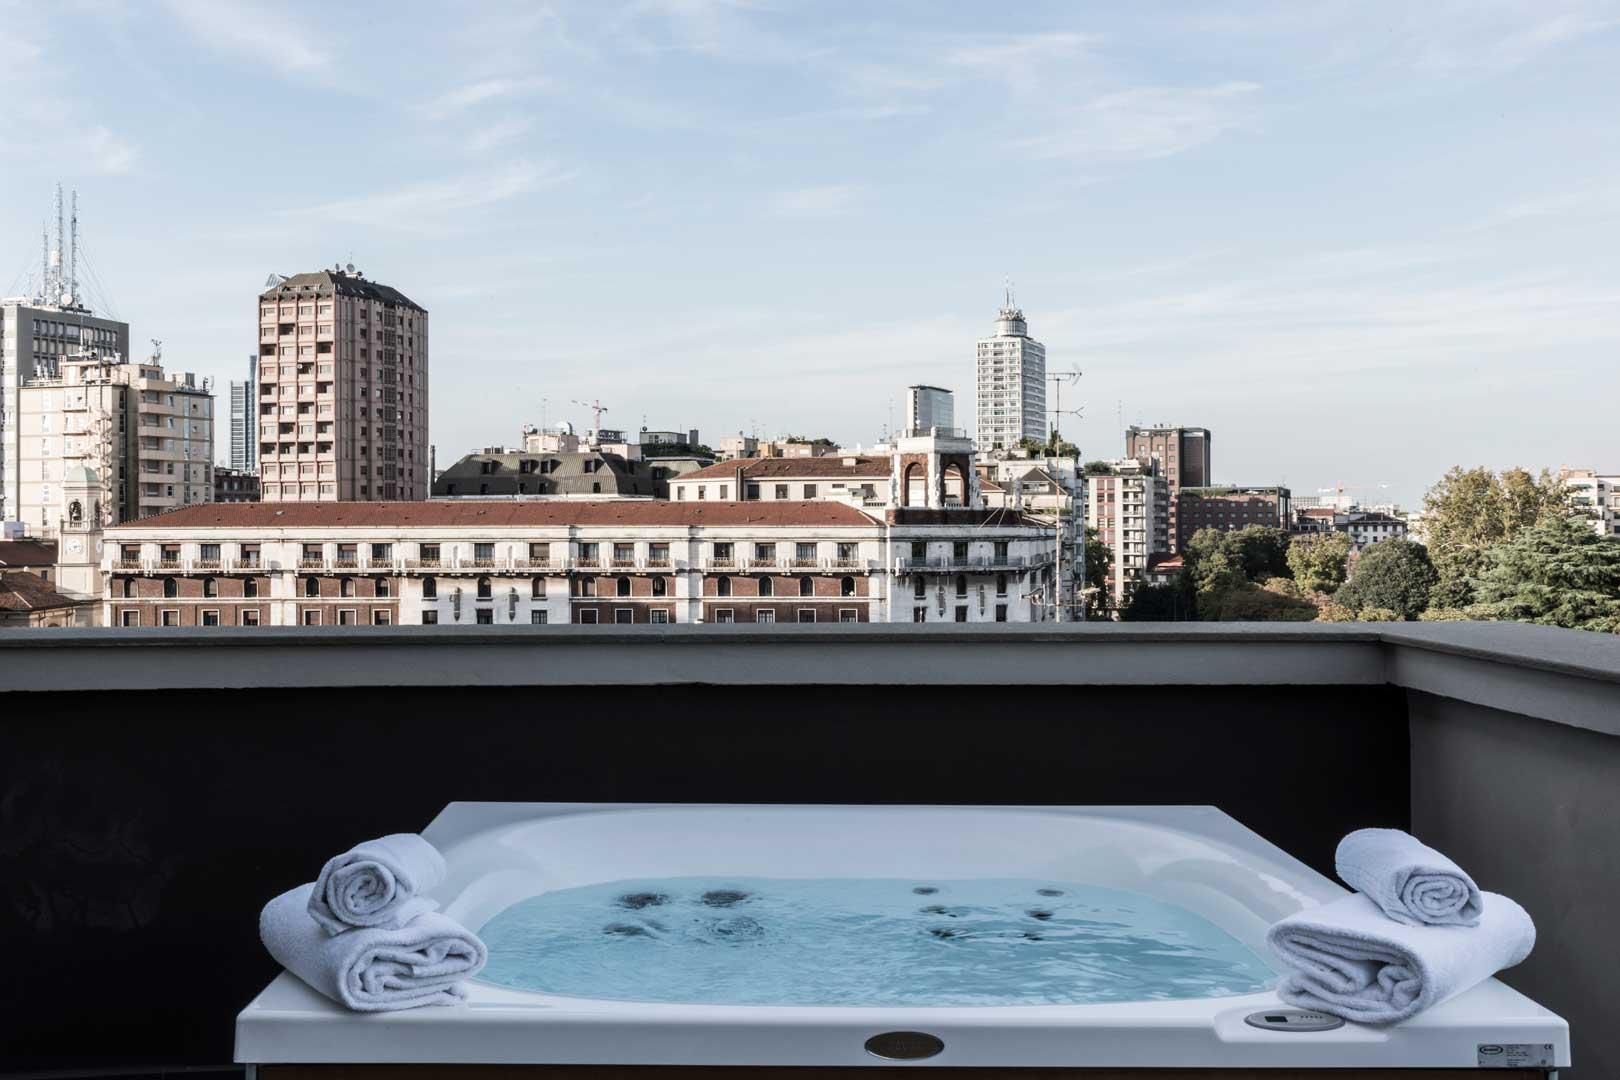 hotel-manin-suite-jacuzzi